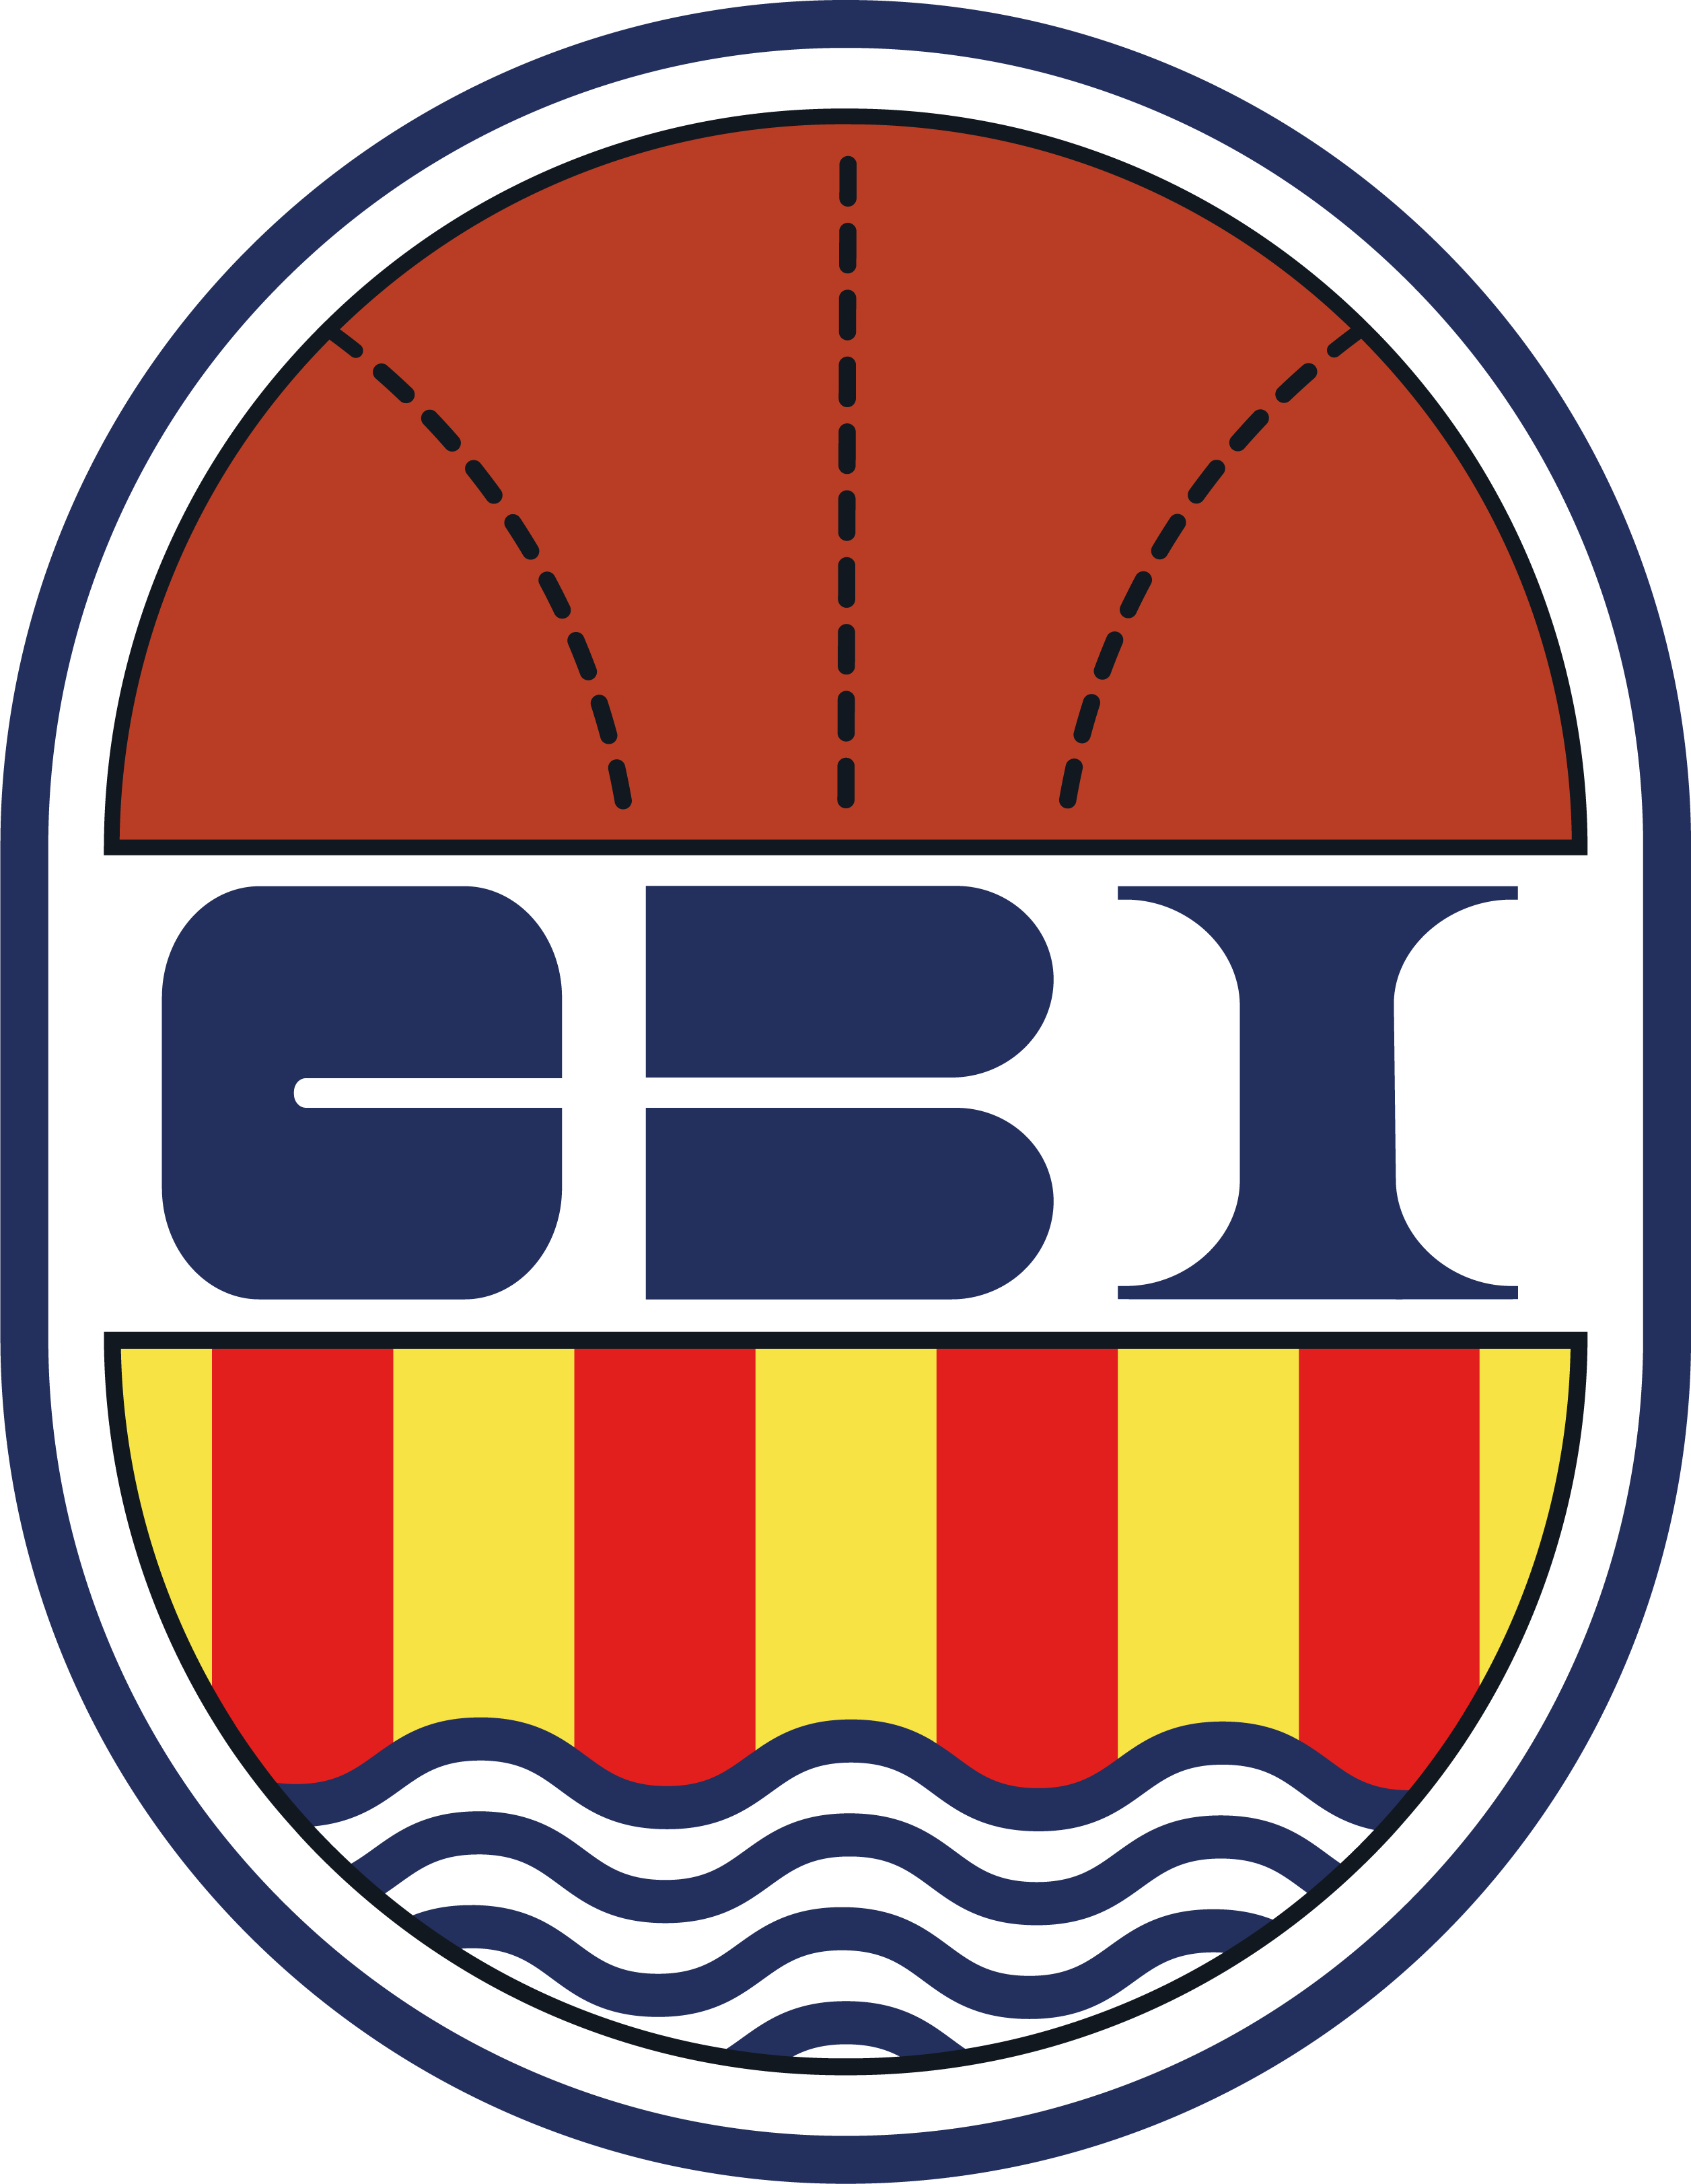 CLUB BASQUET IGUALADA